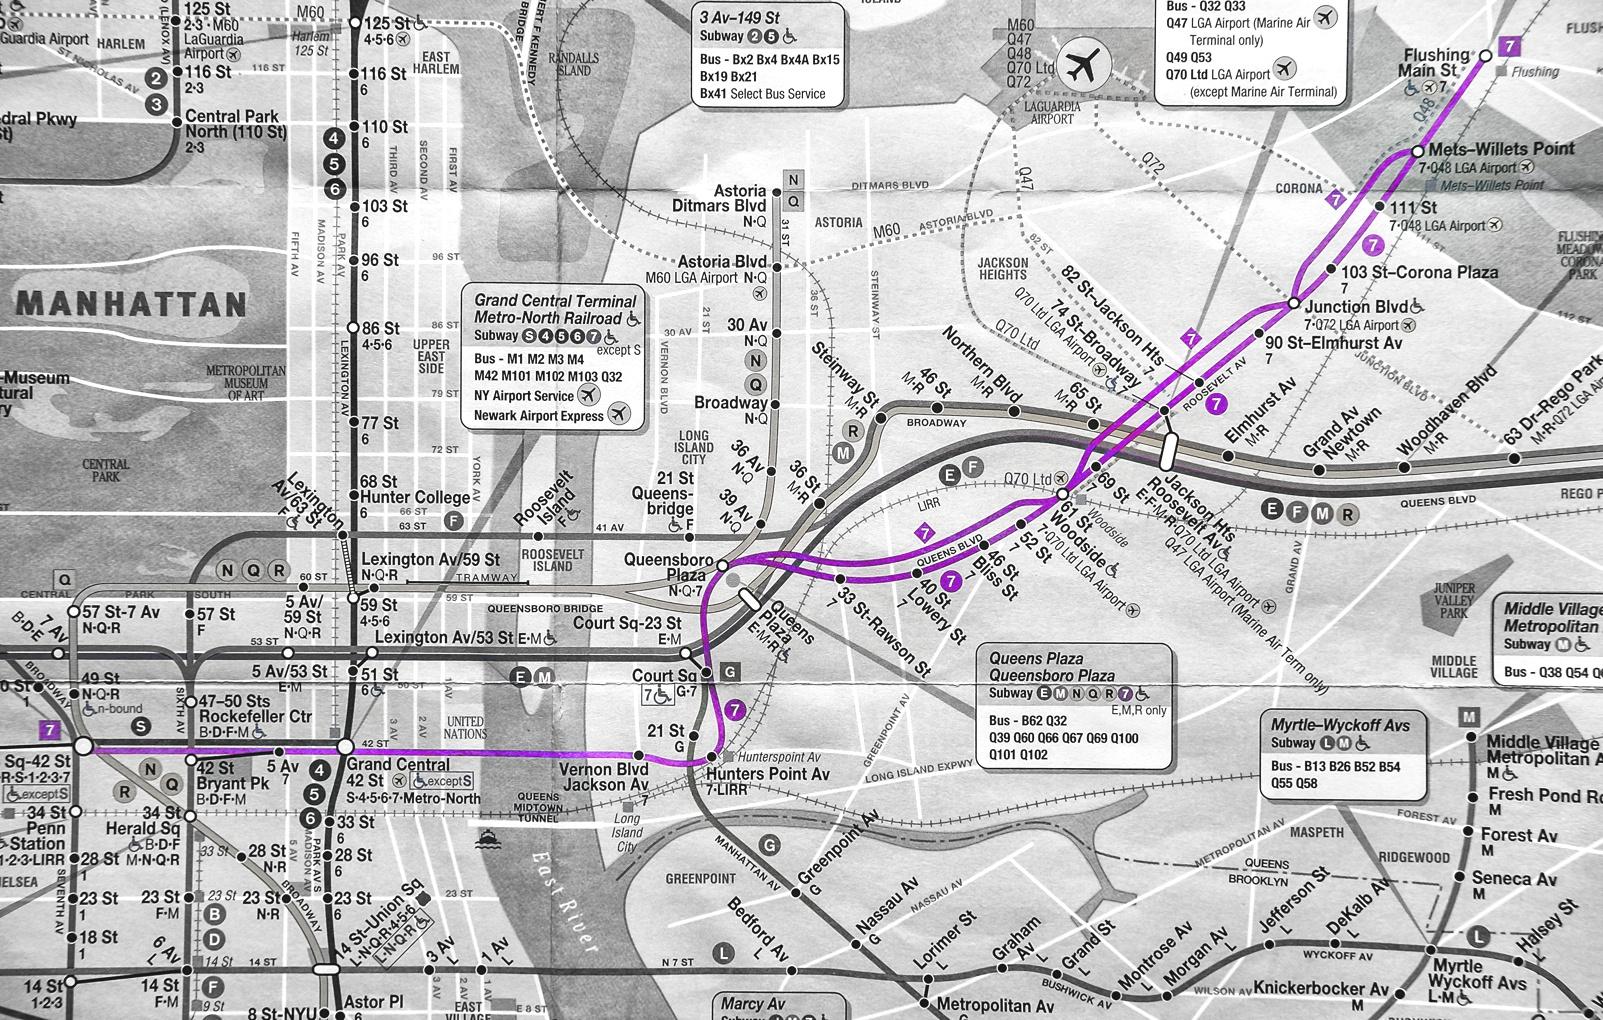 Train Map on